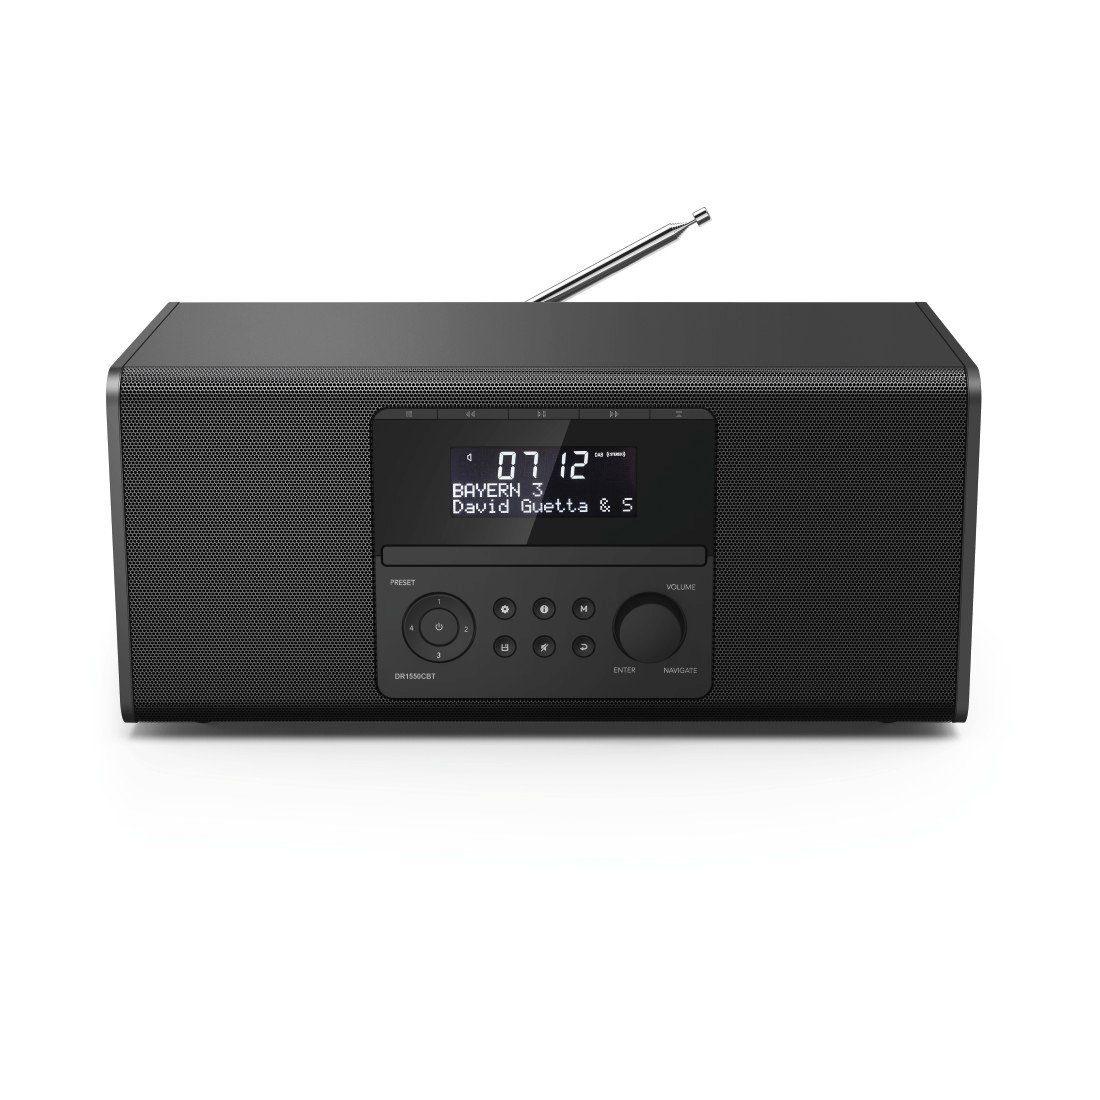 radio cd mp3 sleep preisvergleich die besten angebote. Black Bedroom Furniture Sets. Home Design Ideas